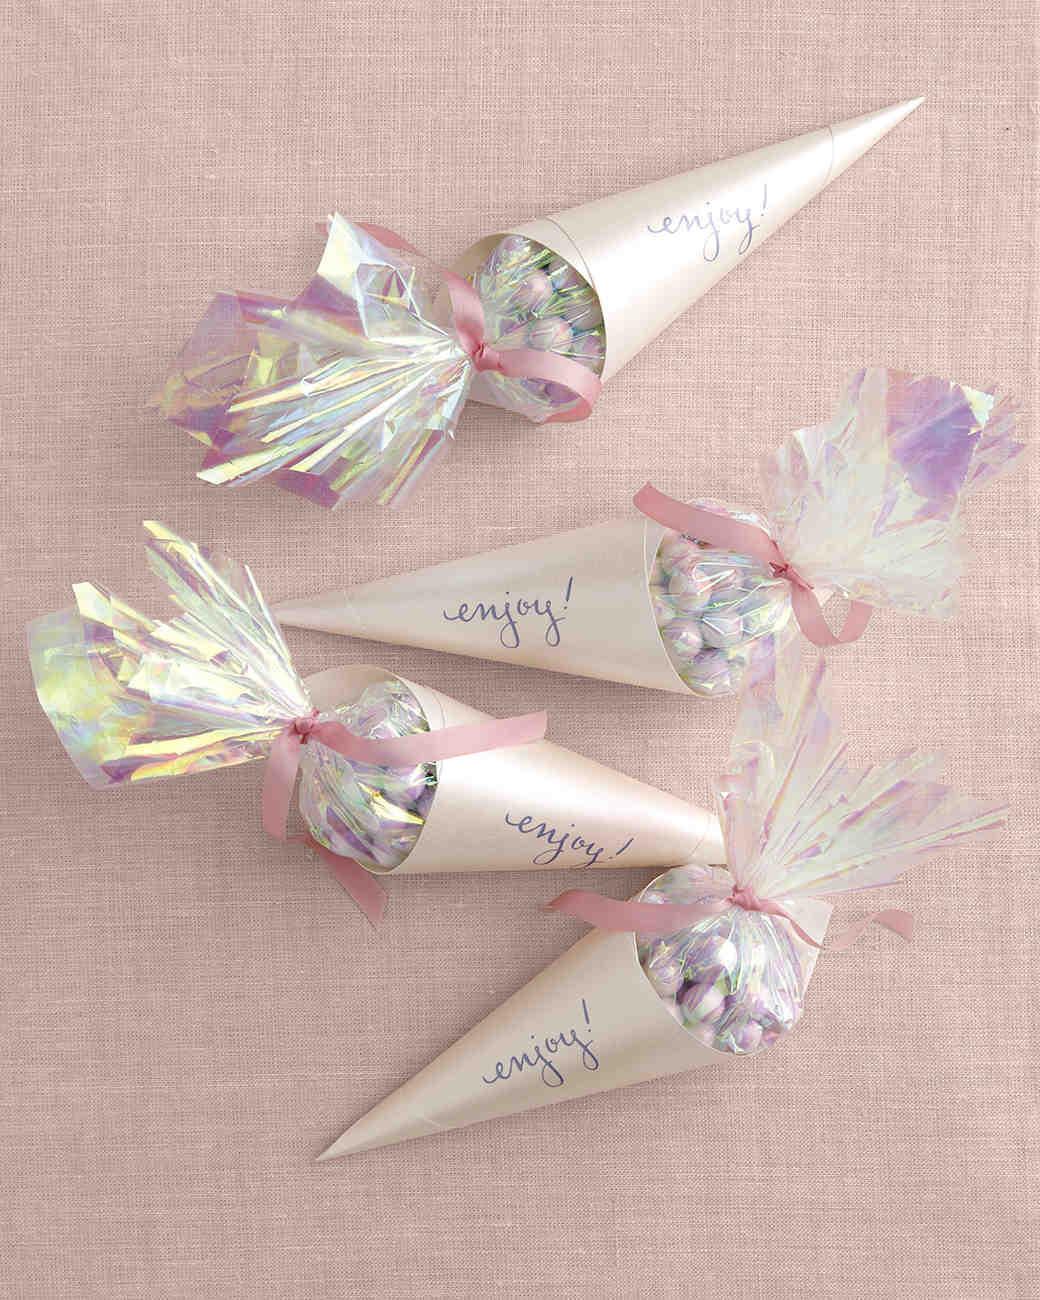 Best ideas about Bridal Shower Favors DIY . Save or Pin Bridal Shower Favor Ideas That You Can DIY Now.